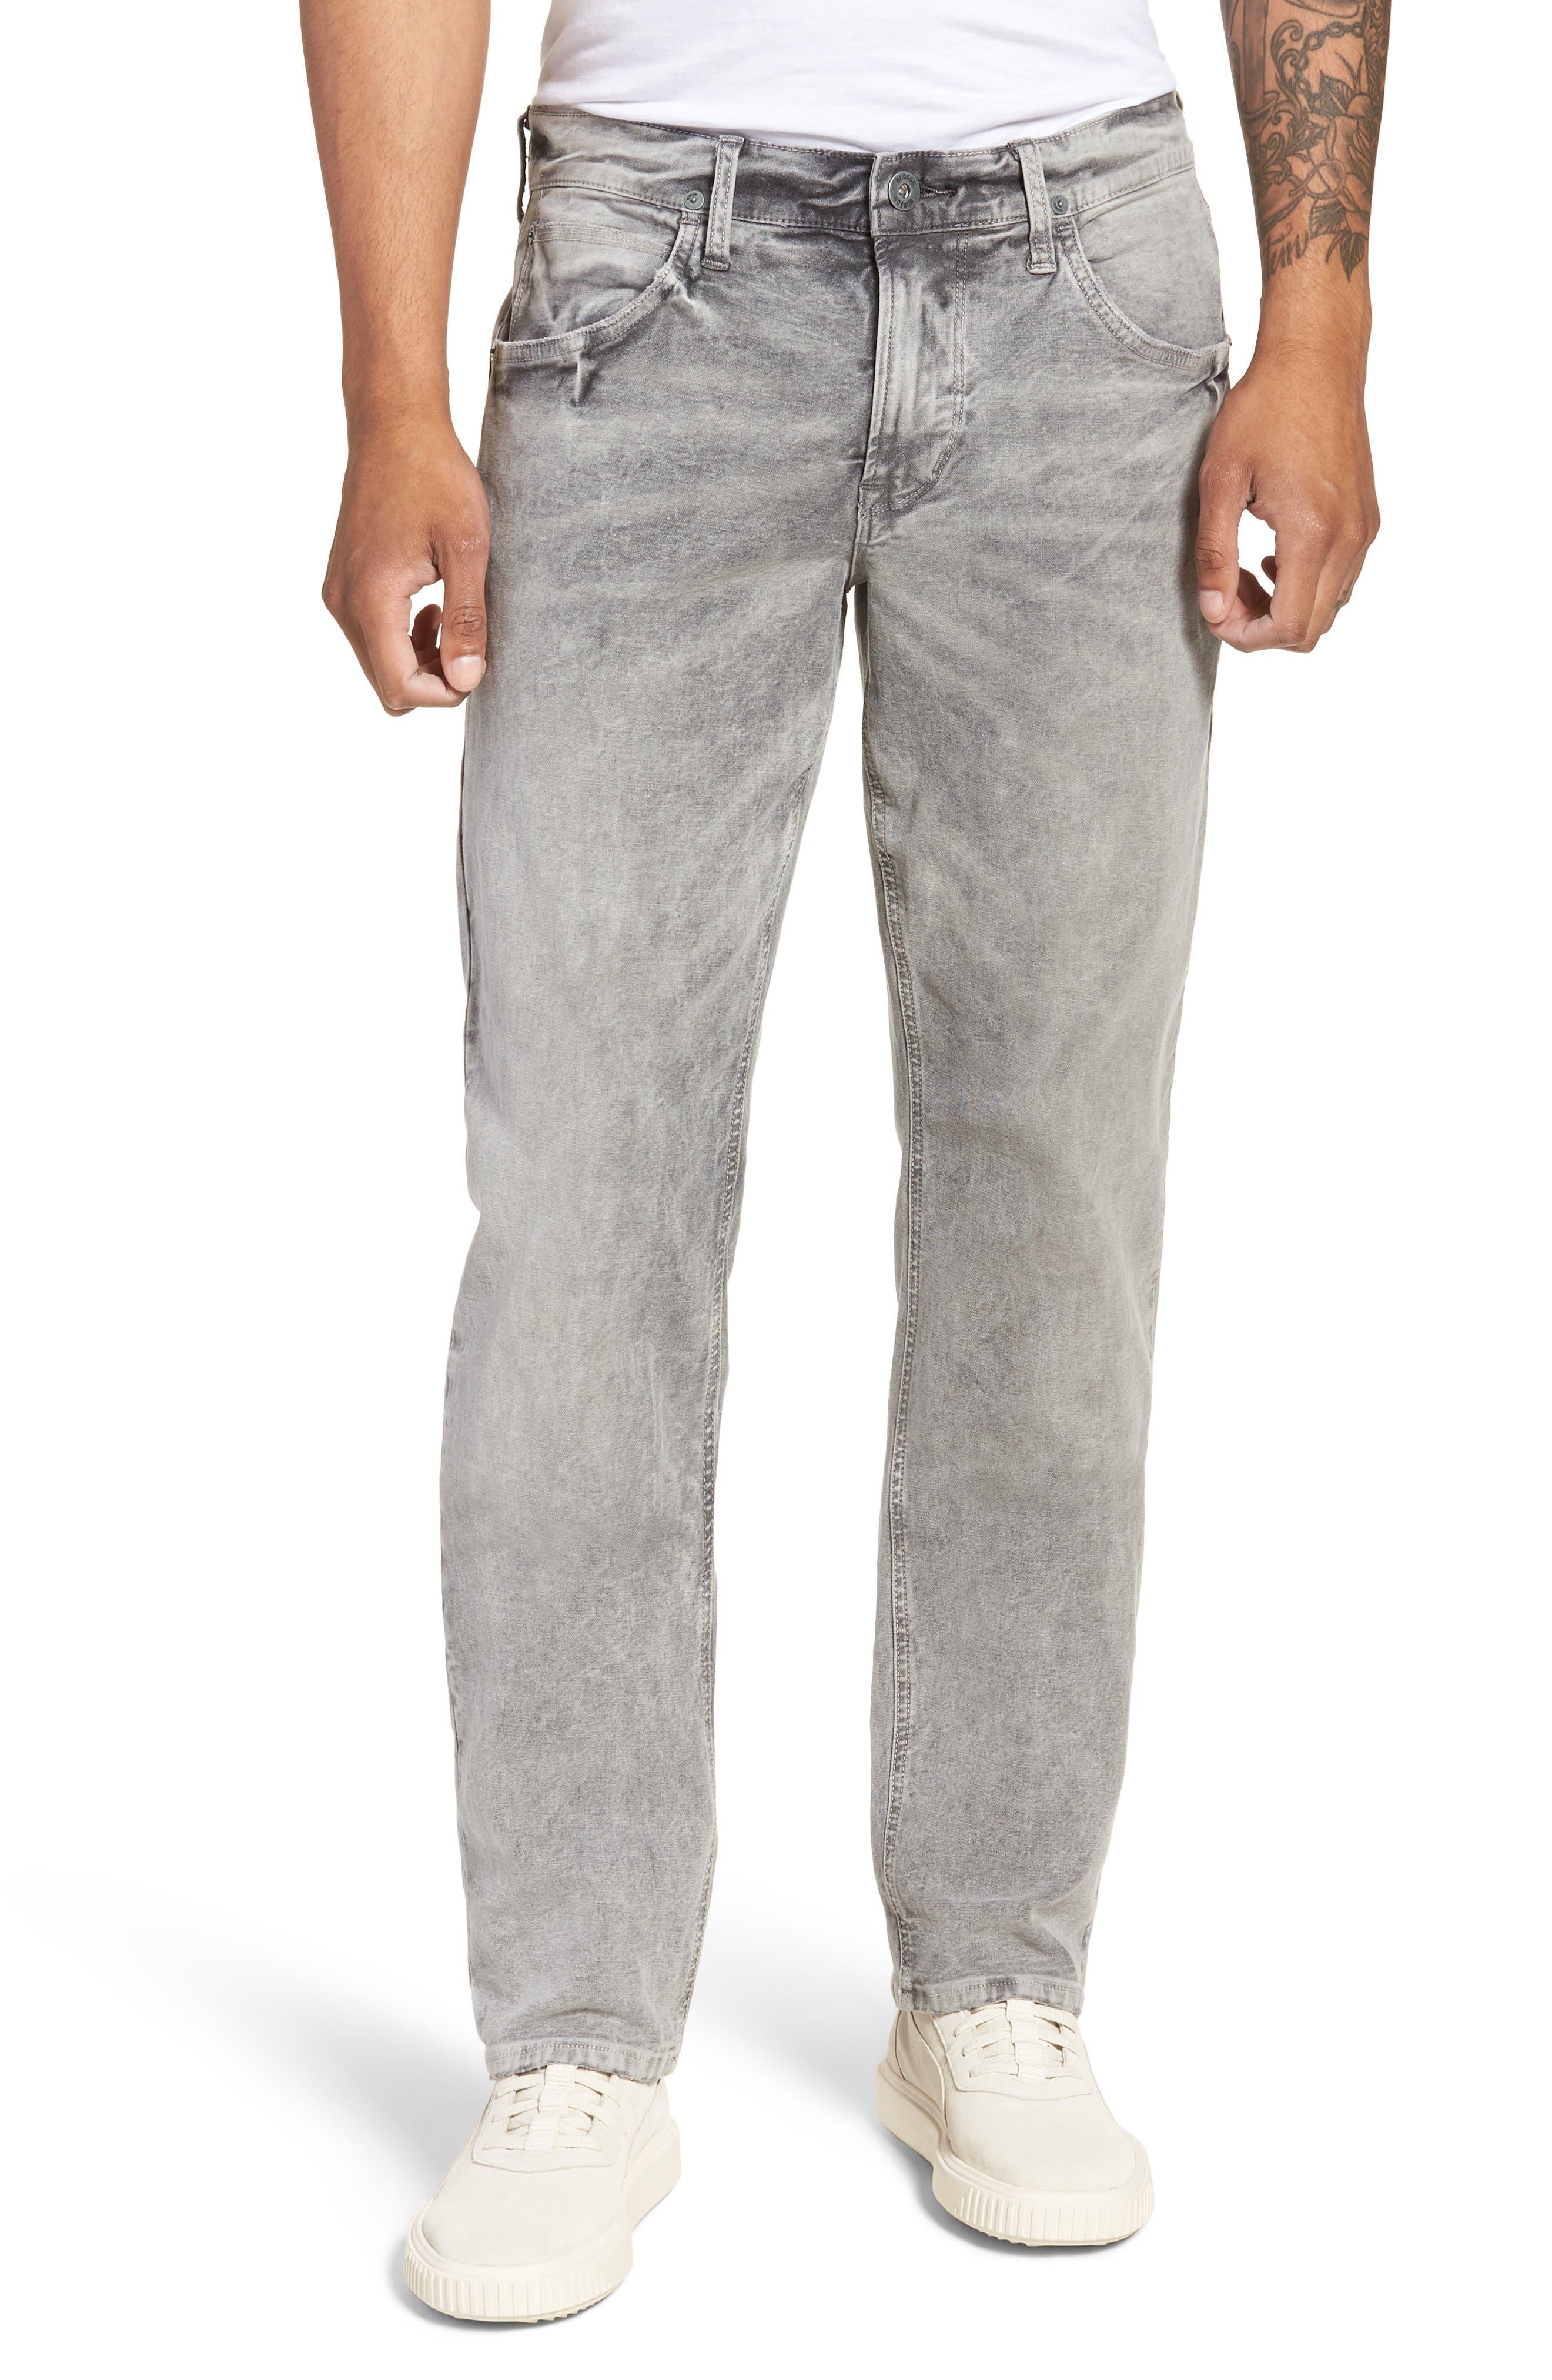 Blake Slim Fit Jeans,                             Main thumbnail 1, color,                             063